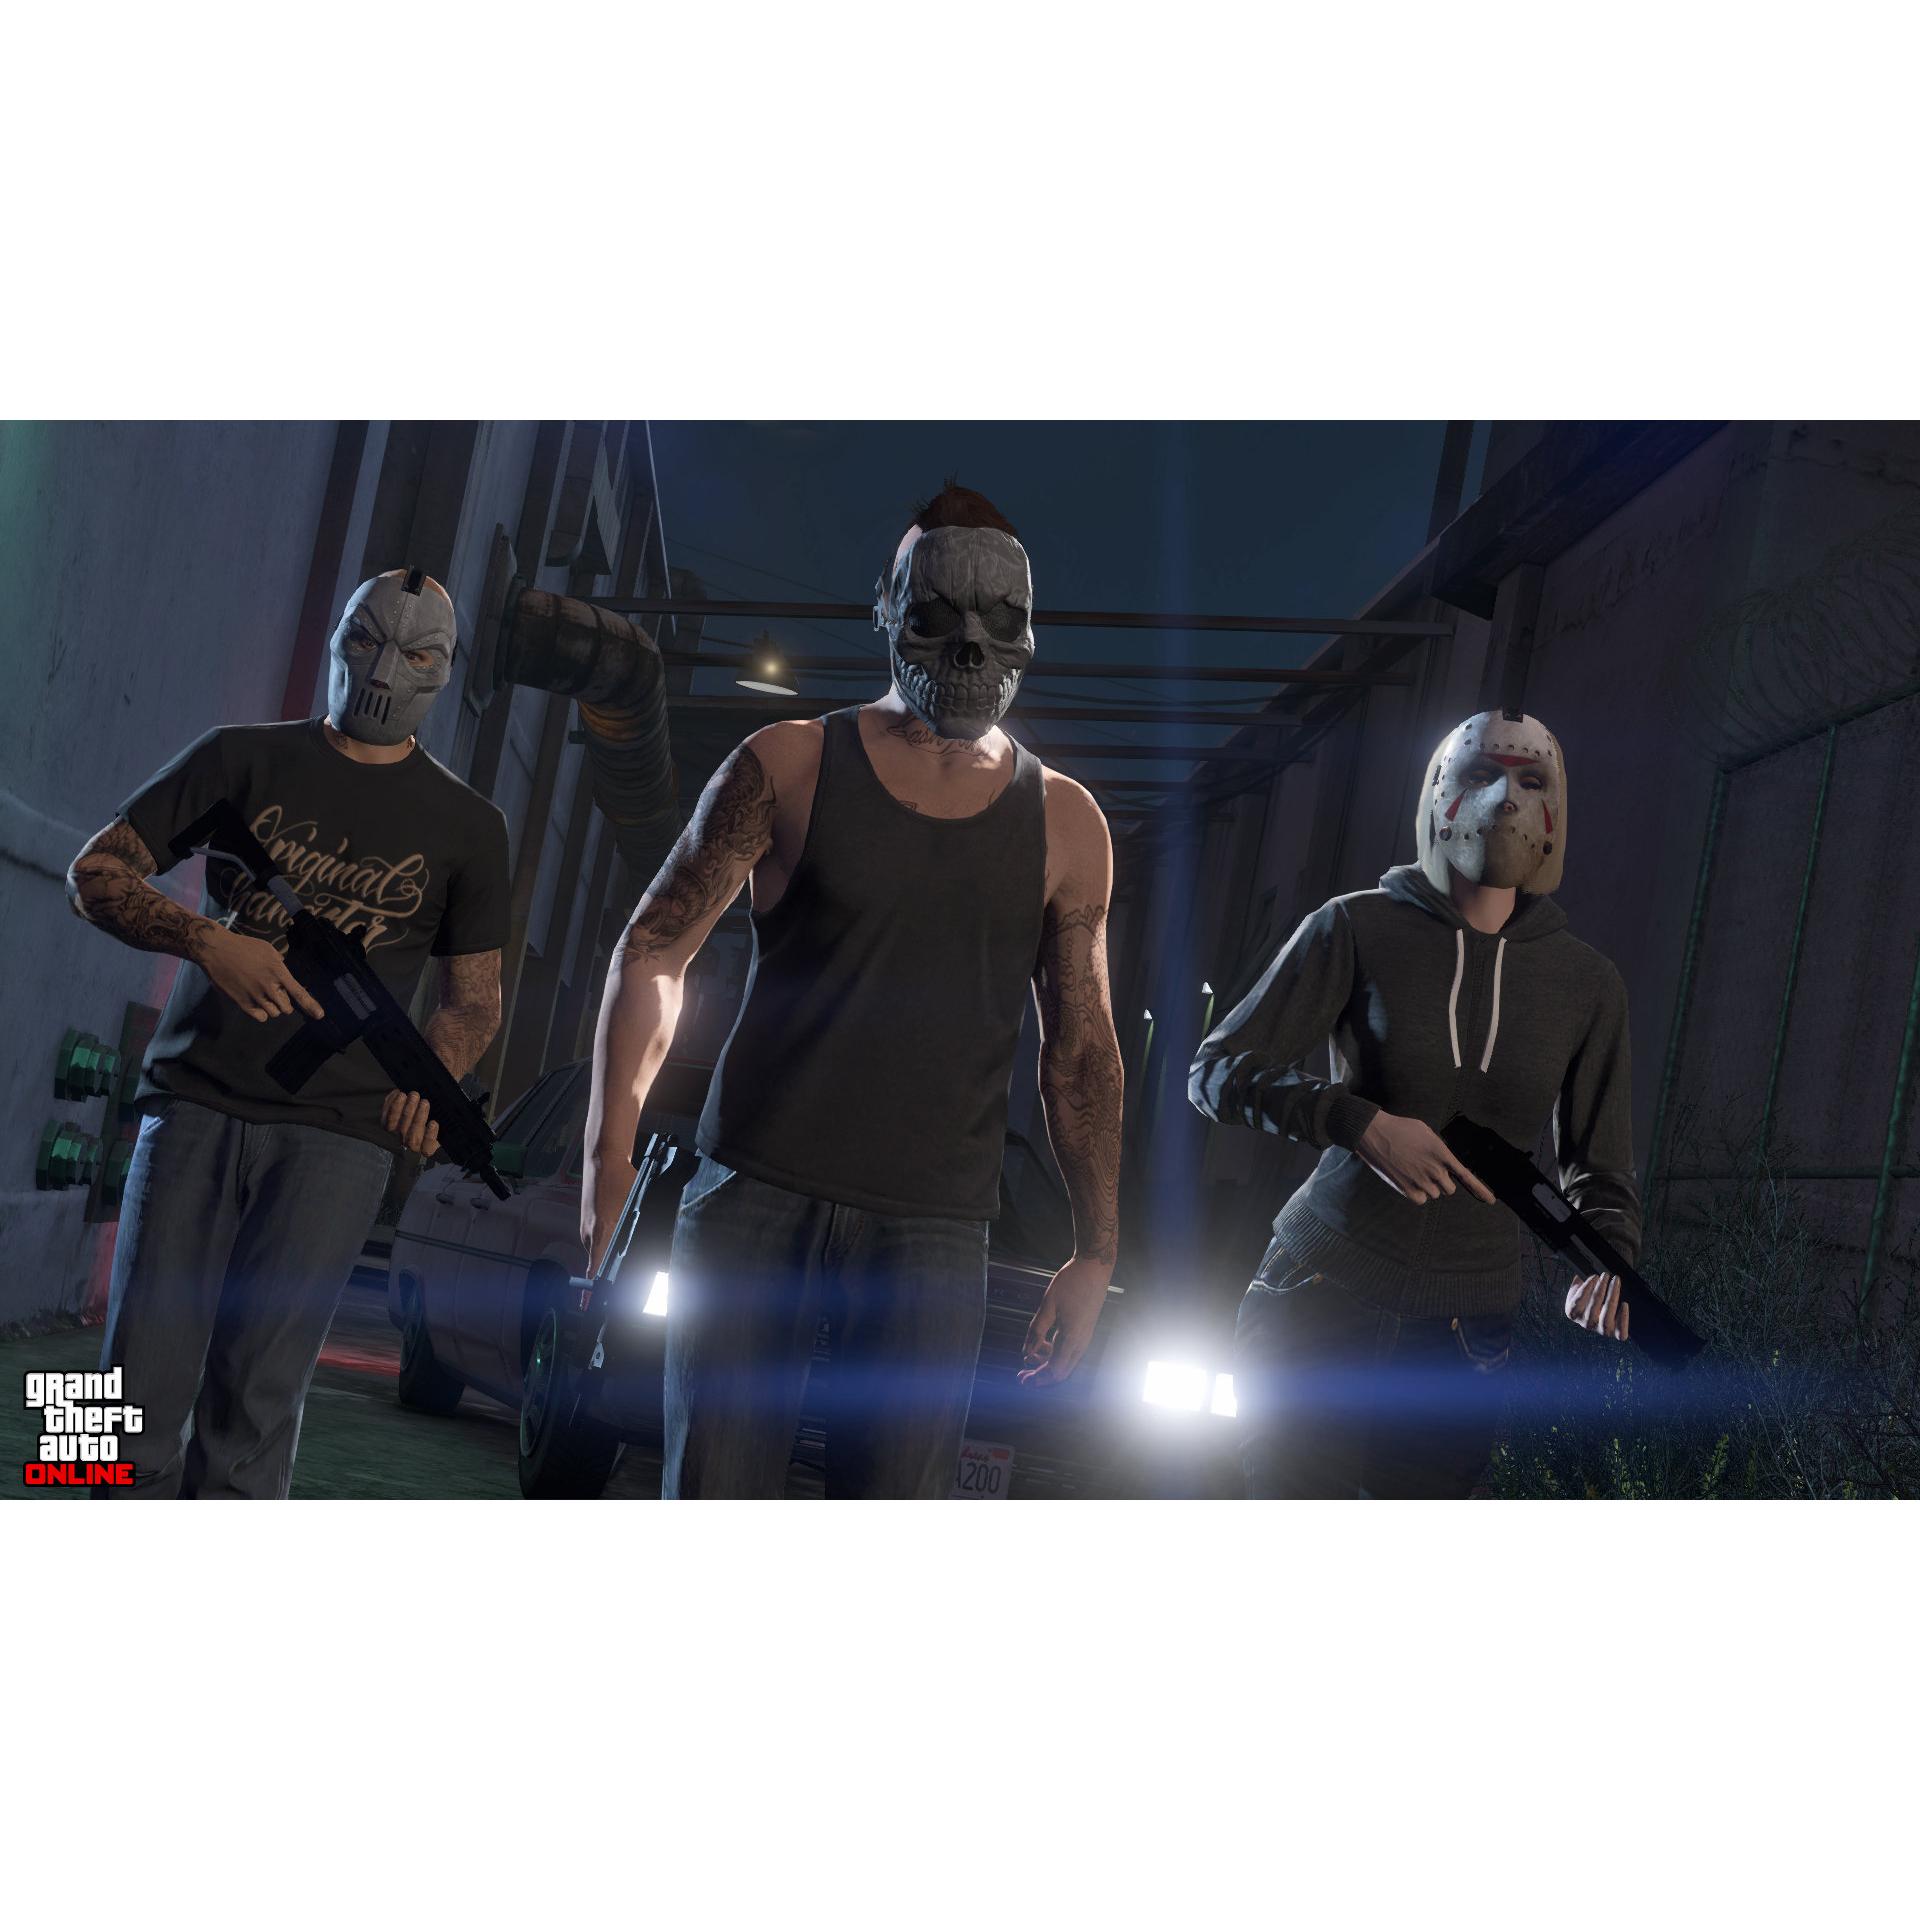 Joc Grand Theft Auto V pentru Xbox One 8